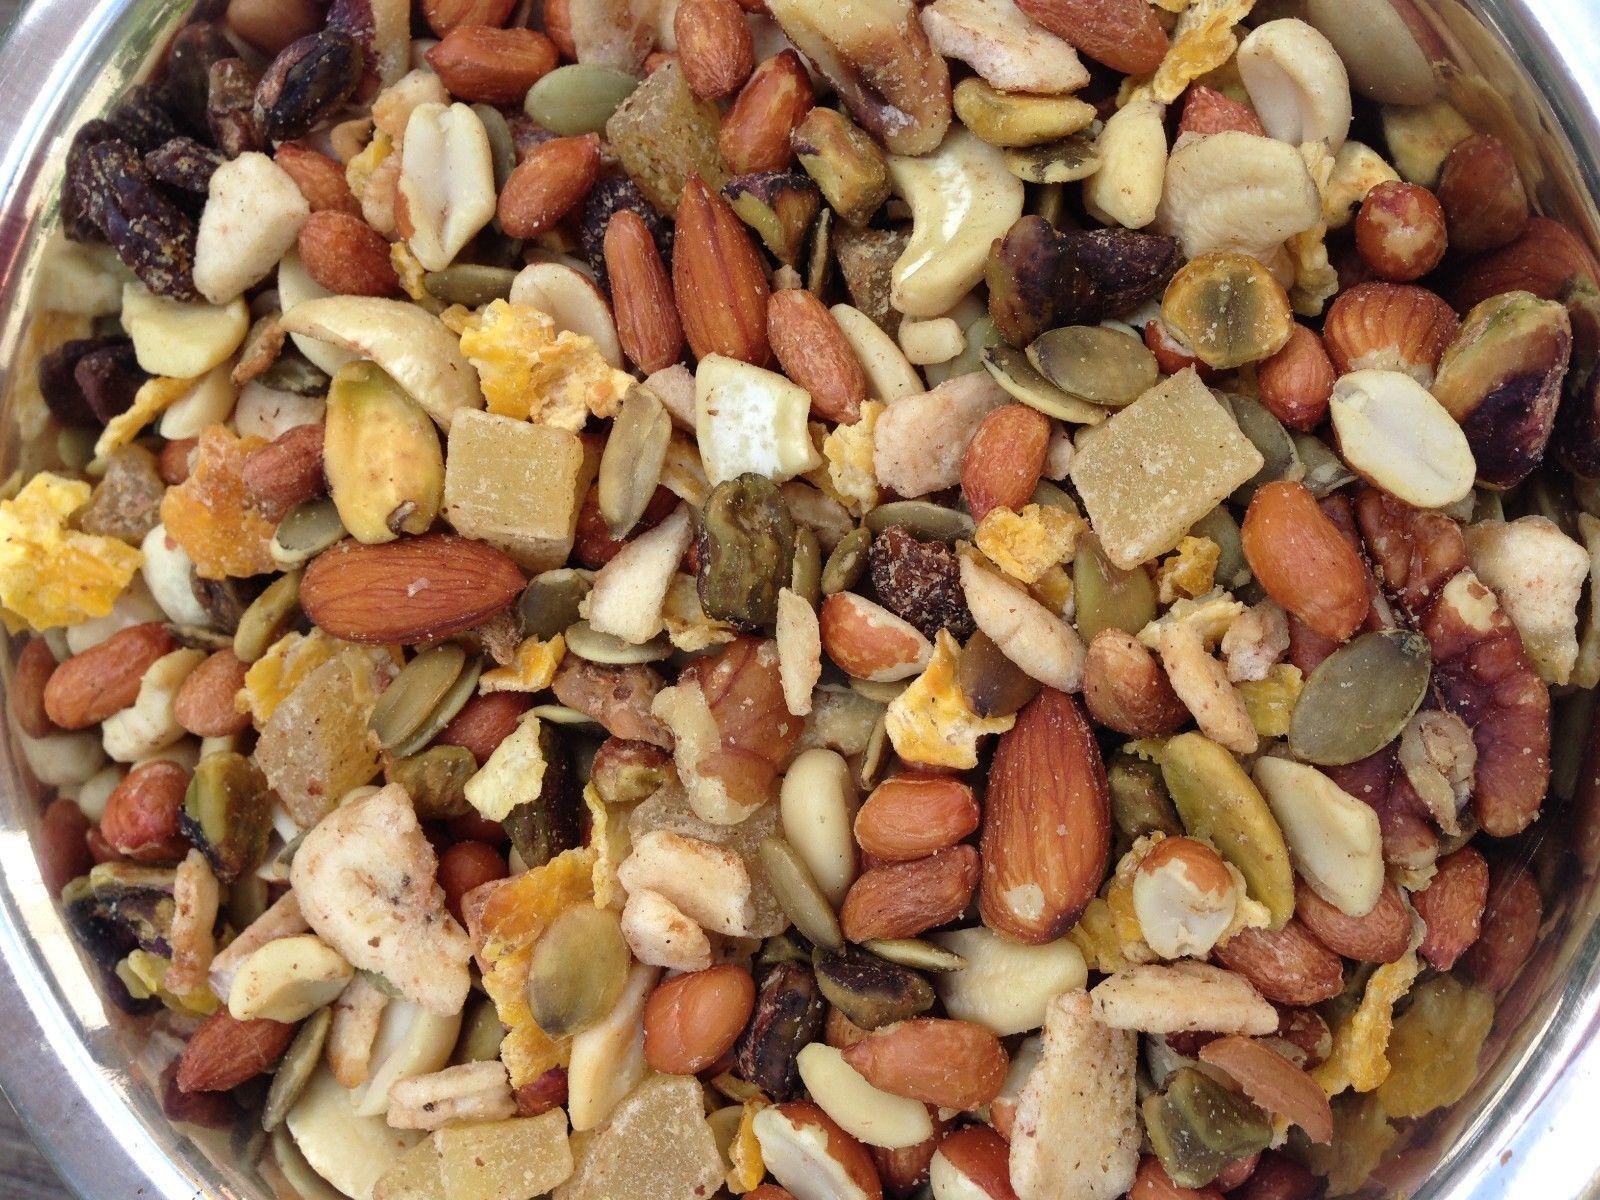 Higgins Sunburst Boca Nuts treat parred shelled nuts macaw conure 20lb sale